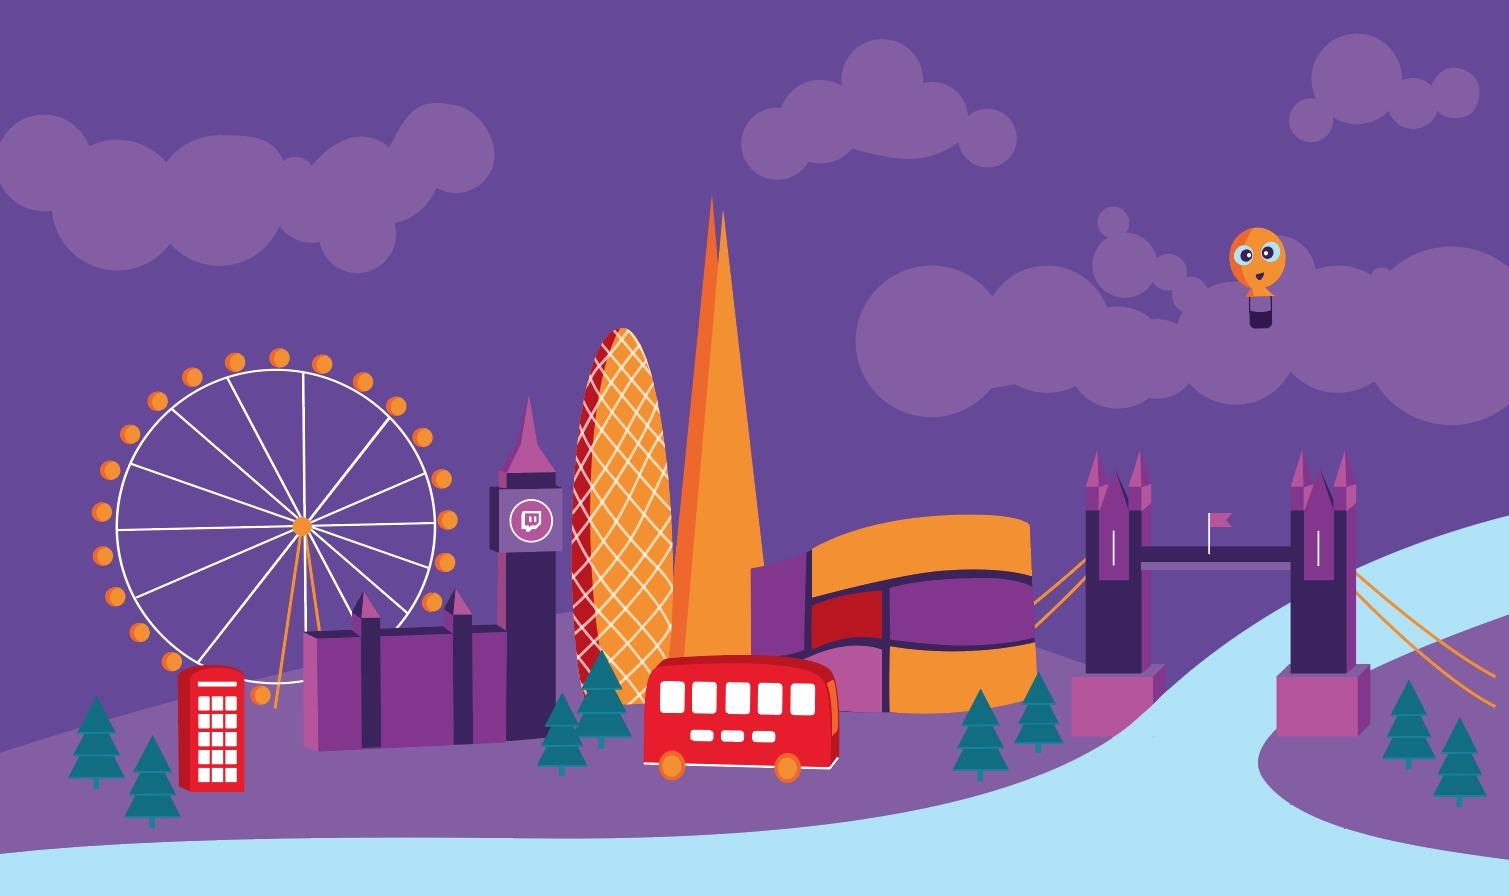 Bespoke Illustration of London Skyline for Twitch.